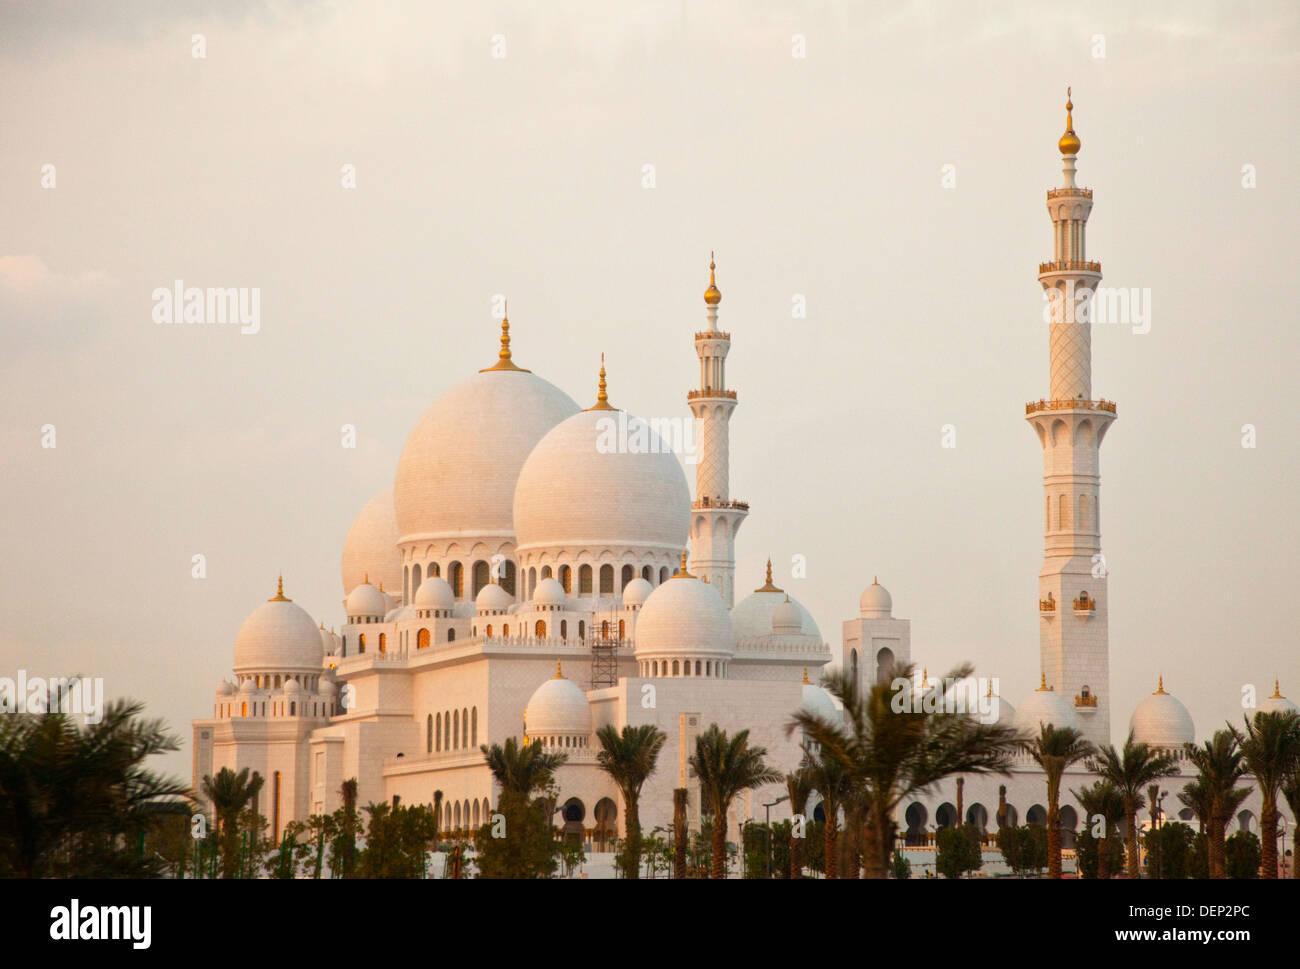 Emirate of Abu Dhabi. EAU. Persian Gulf. Arabia. - Stock Image